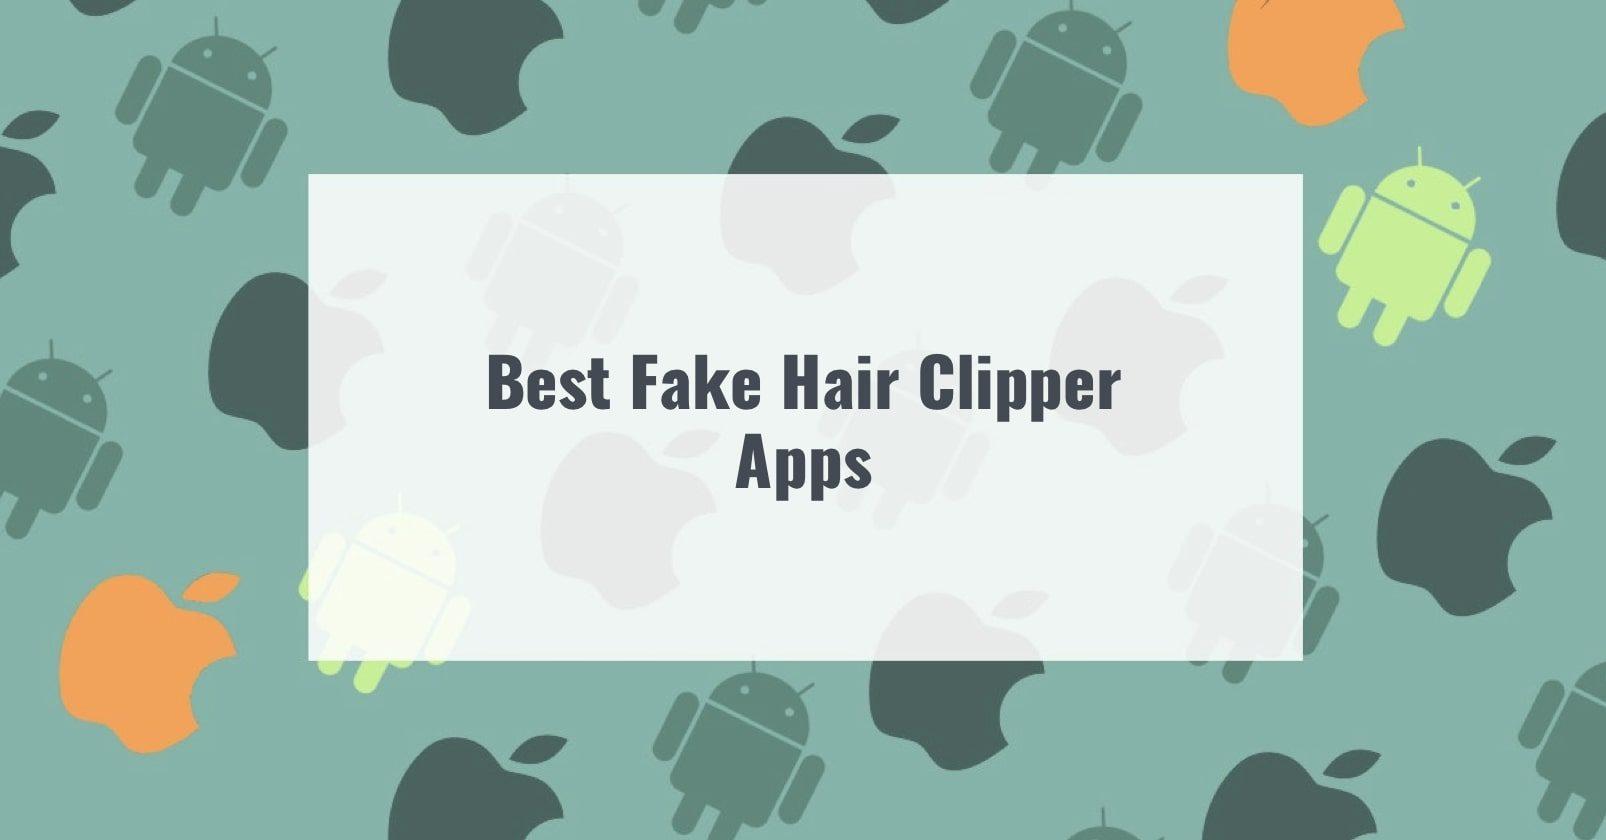 Best Fake Hair Clipper Apps